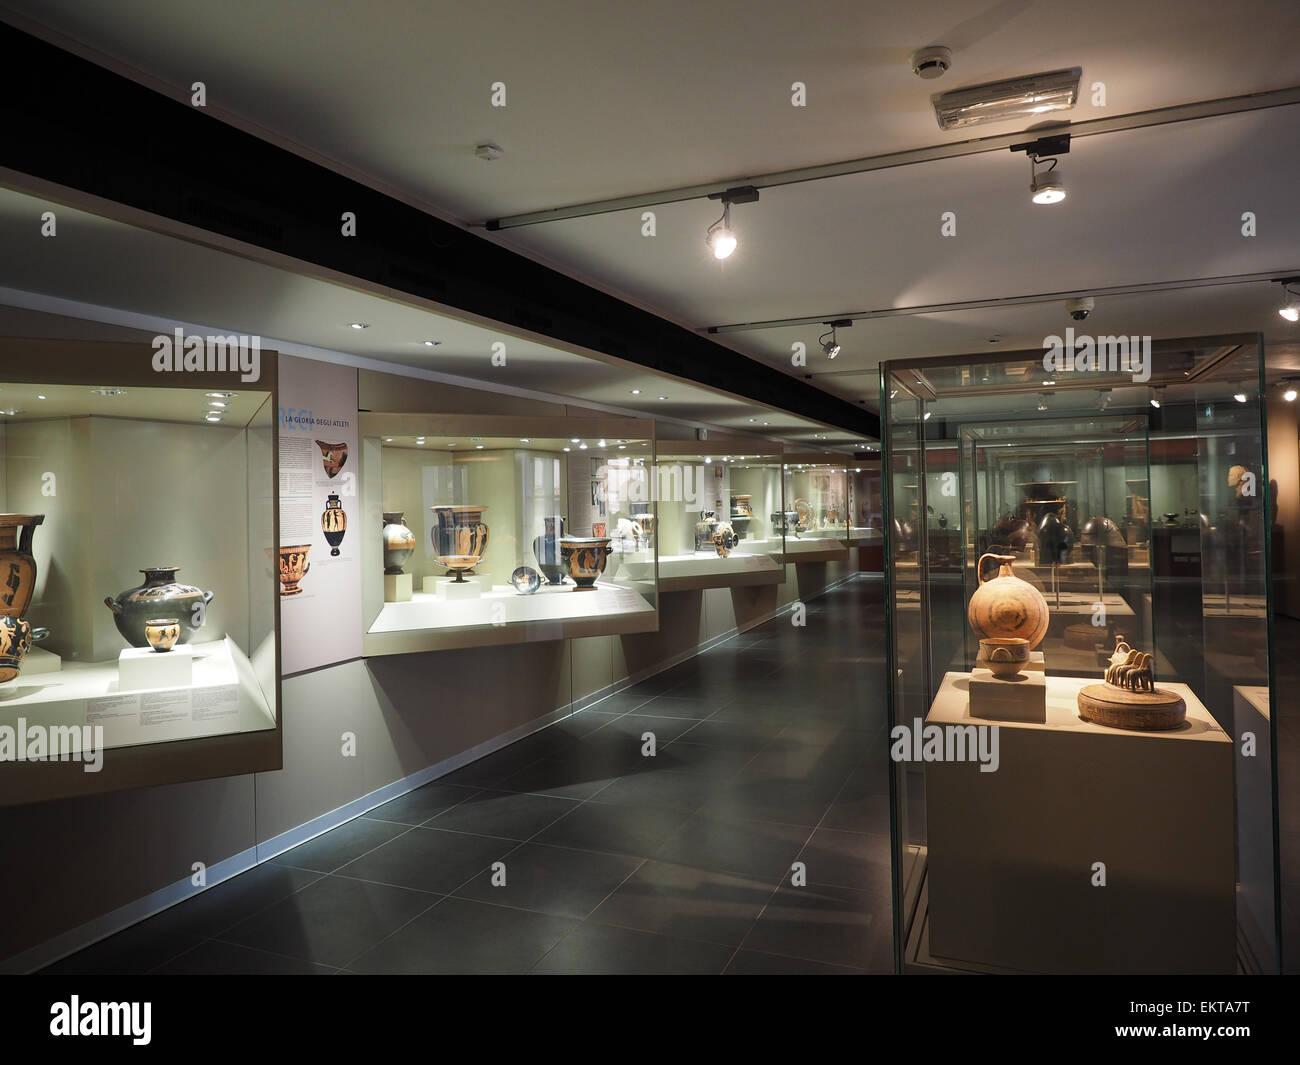 Museo archeologico, Corso Magenta street, Milano, Lombardia, Italia, Europa Immagini Stock